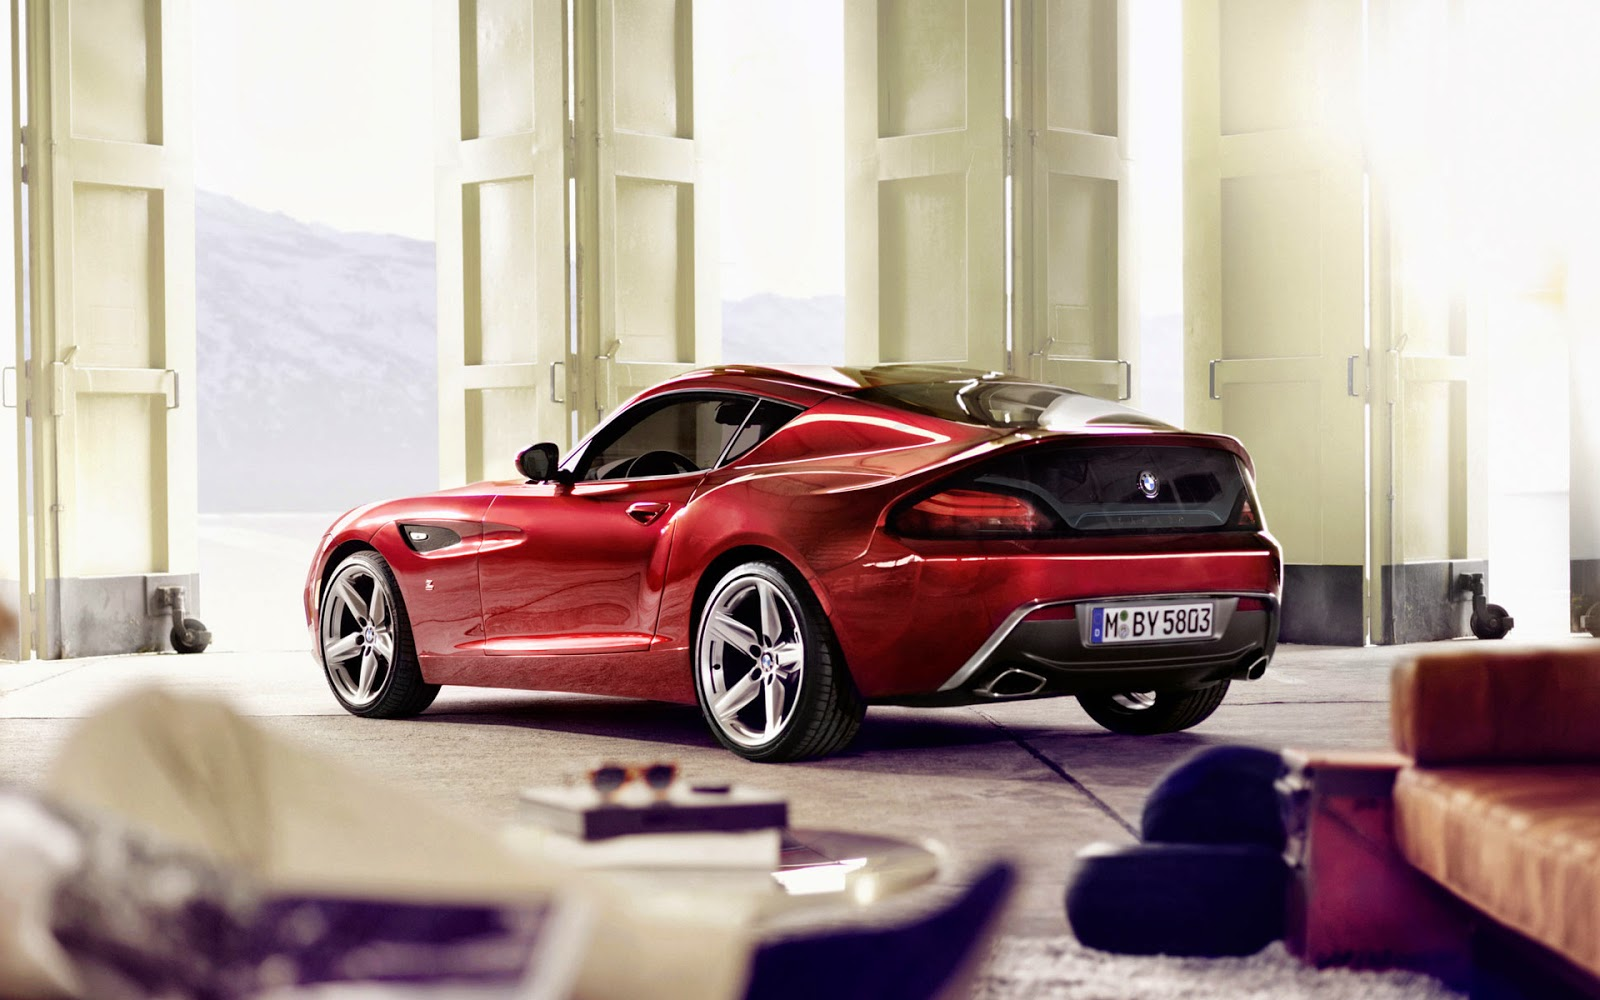 "<img src=""http://1.bp.blogspot.com/-KtzwW5WWqAc/UzM1gRbQPHI/AAAAAAAALOo/AOyiitdvxAM/s1600/bmw-wallpaper-car.jpg"" alt=""BMW Wallpapers"" />"